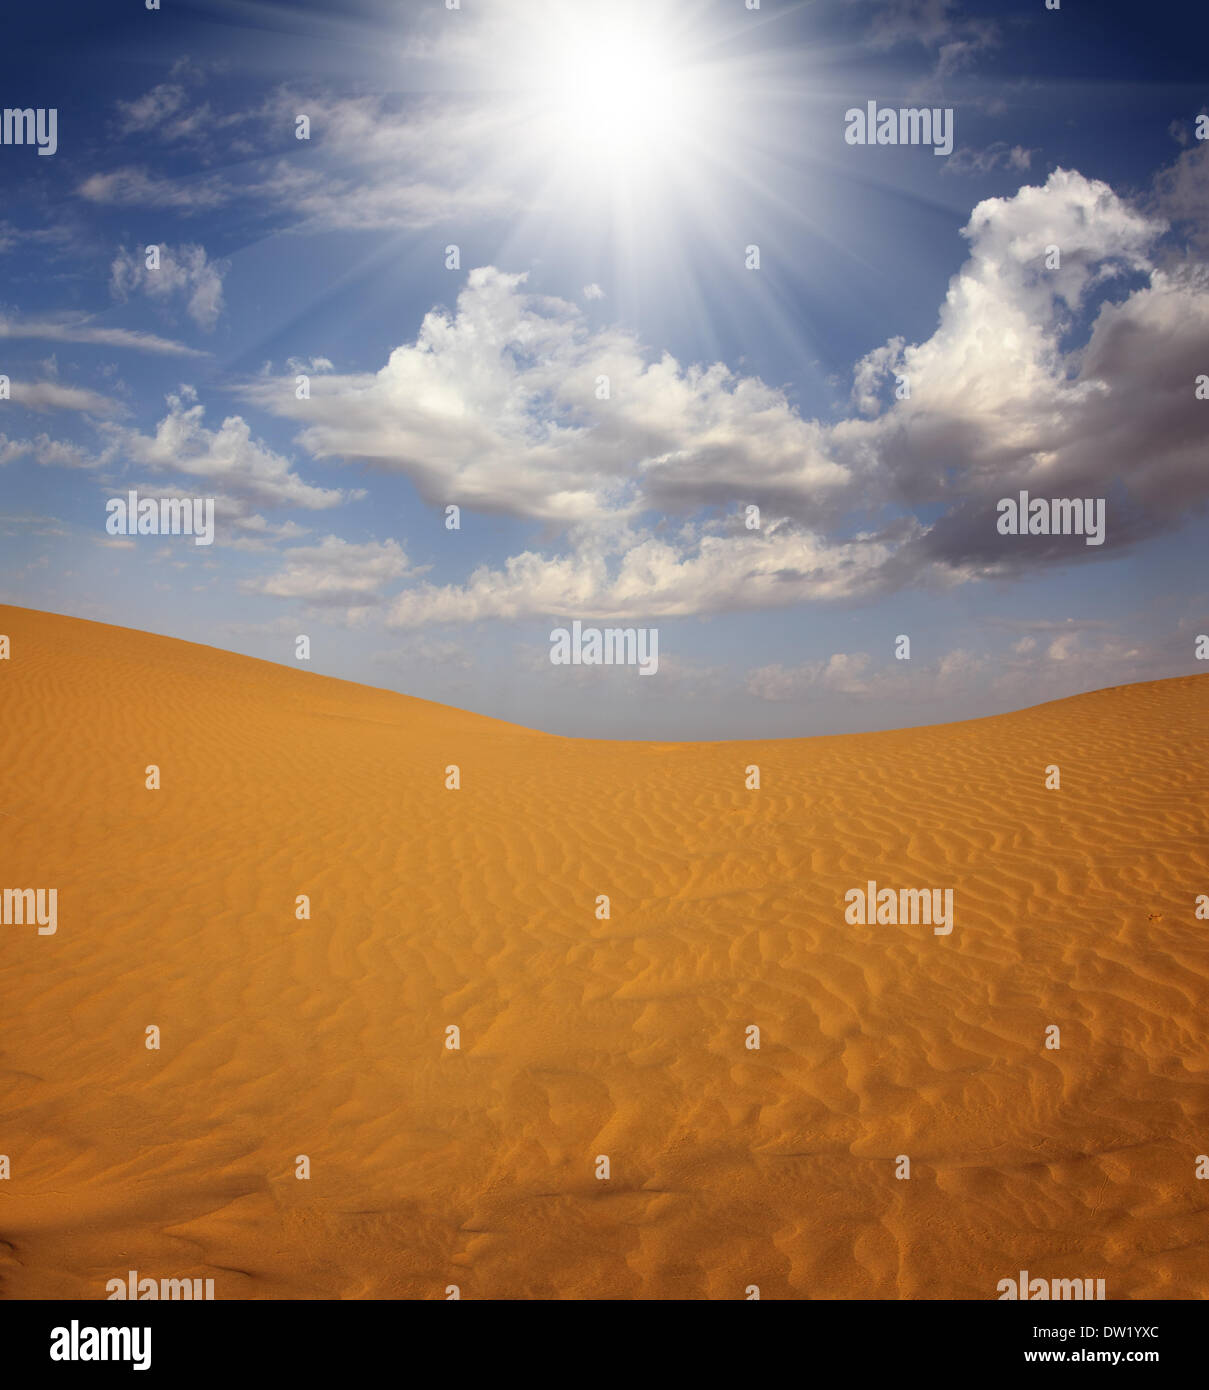 landsape in Tar desert India - Stock Image